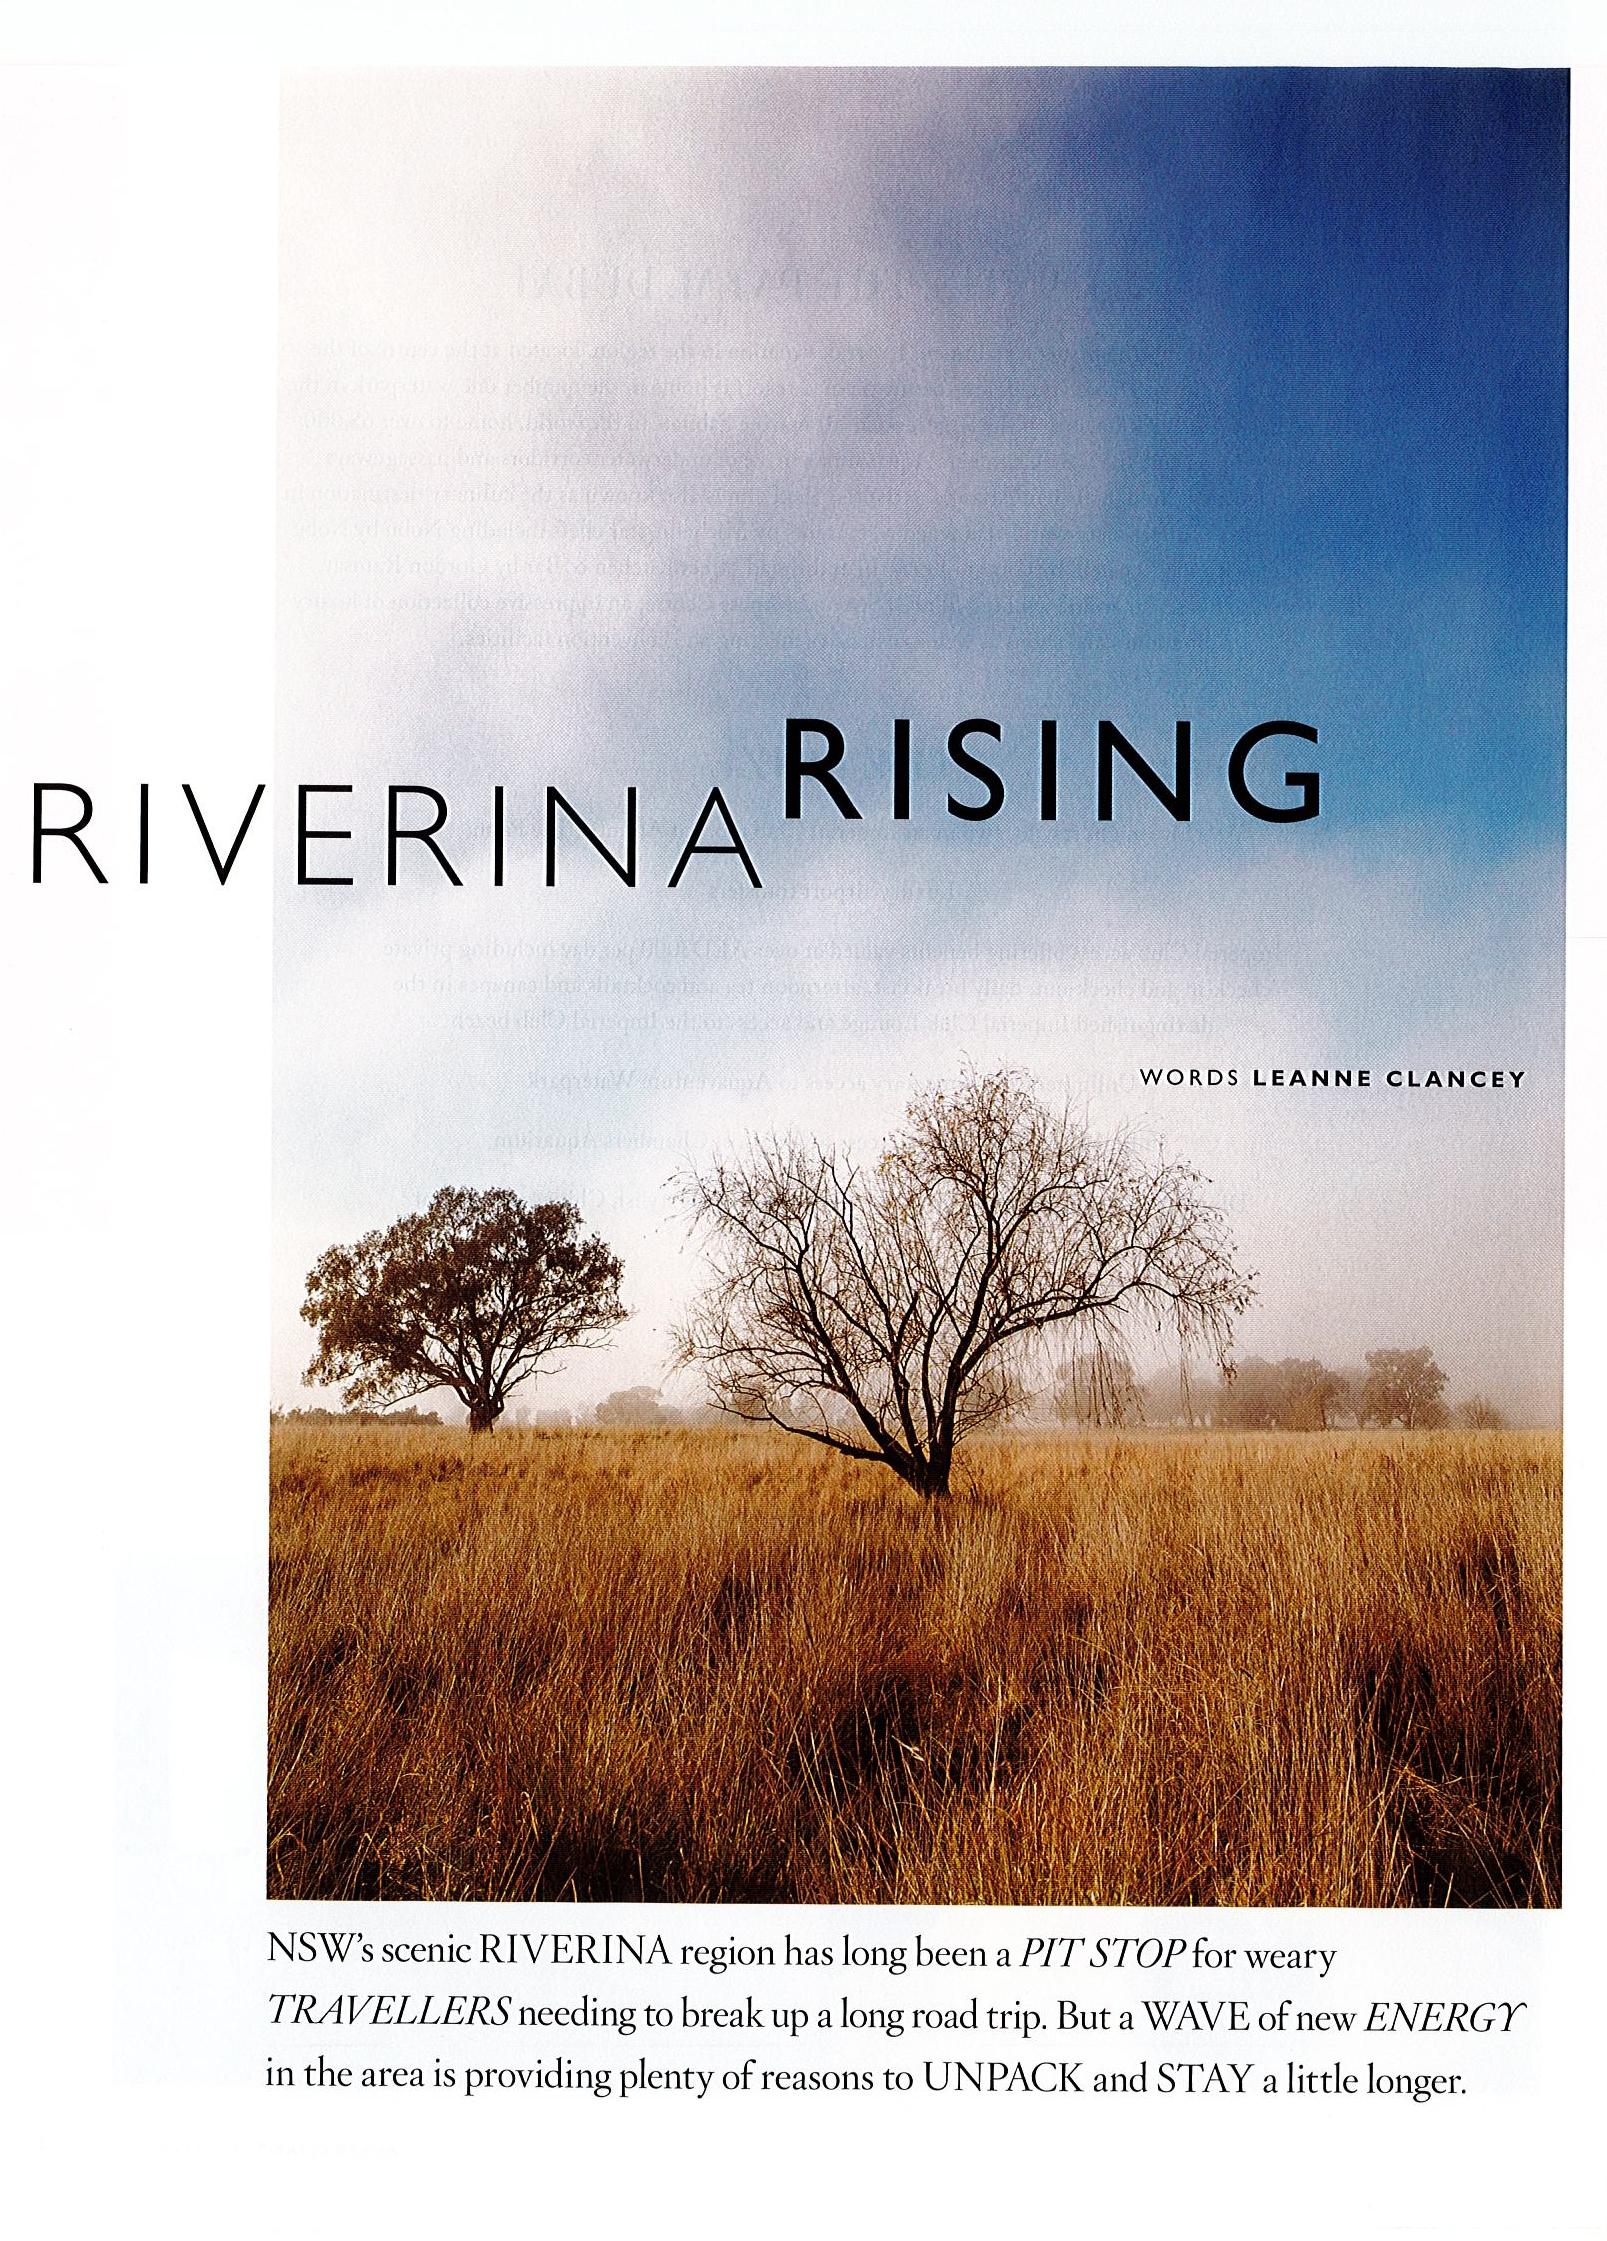 2 May 18_Riverina Murray_Australian Traveller_Riverina Rising_F_Page_1_Image_0001.jpg